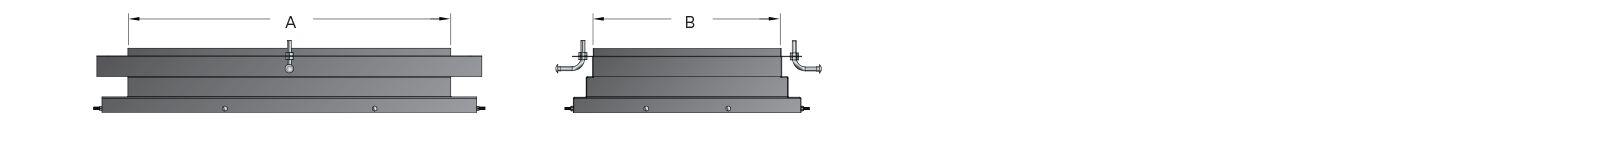 Large Mout Poly Dispenser Sumps Top Frame - Dims.psd